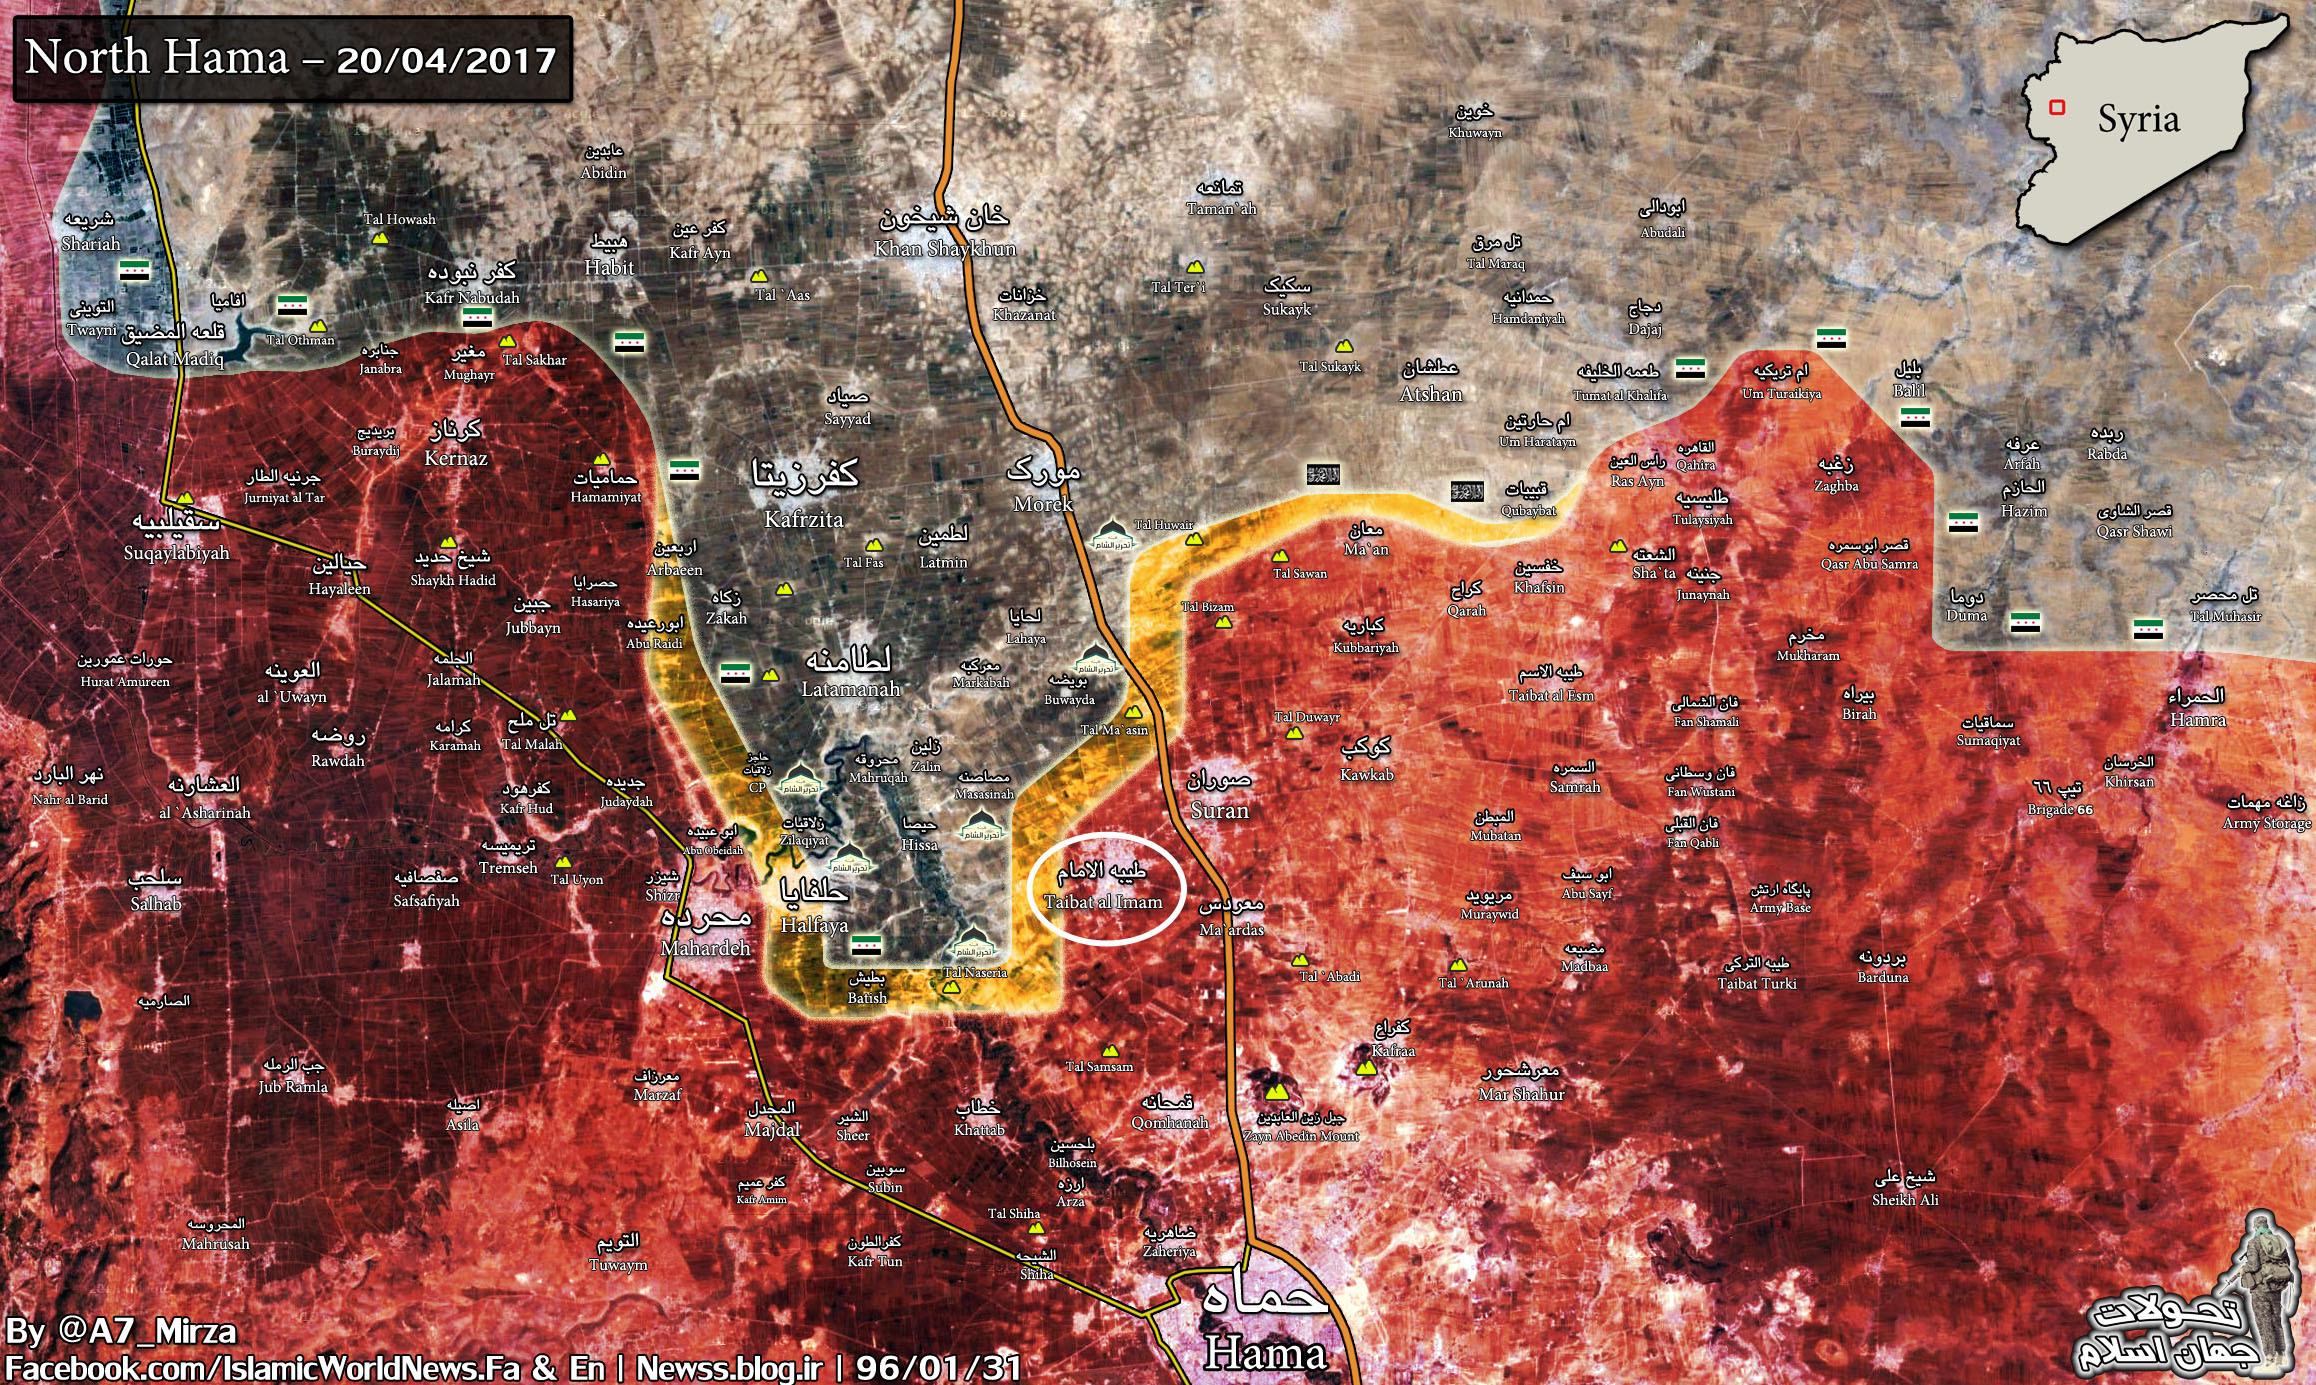 Govt Forces Advancing On Helfaya After Liberation Of Taibat al-Islam (Videos)